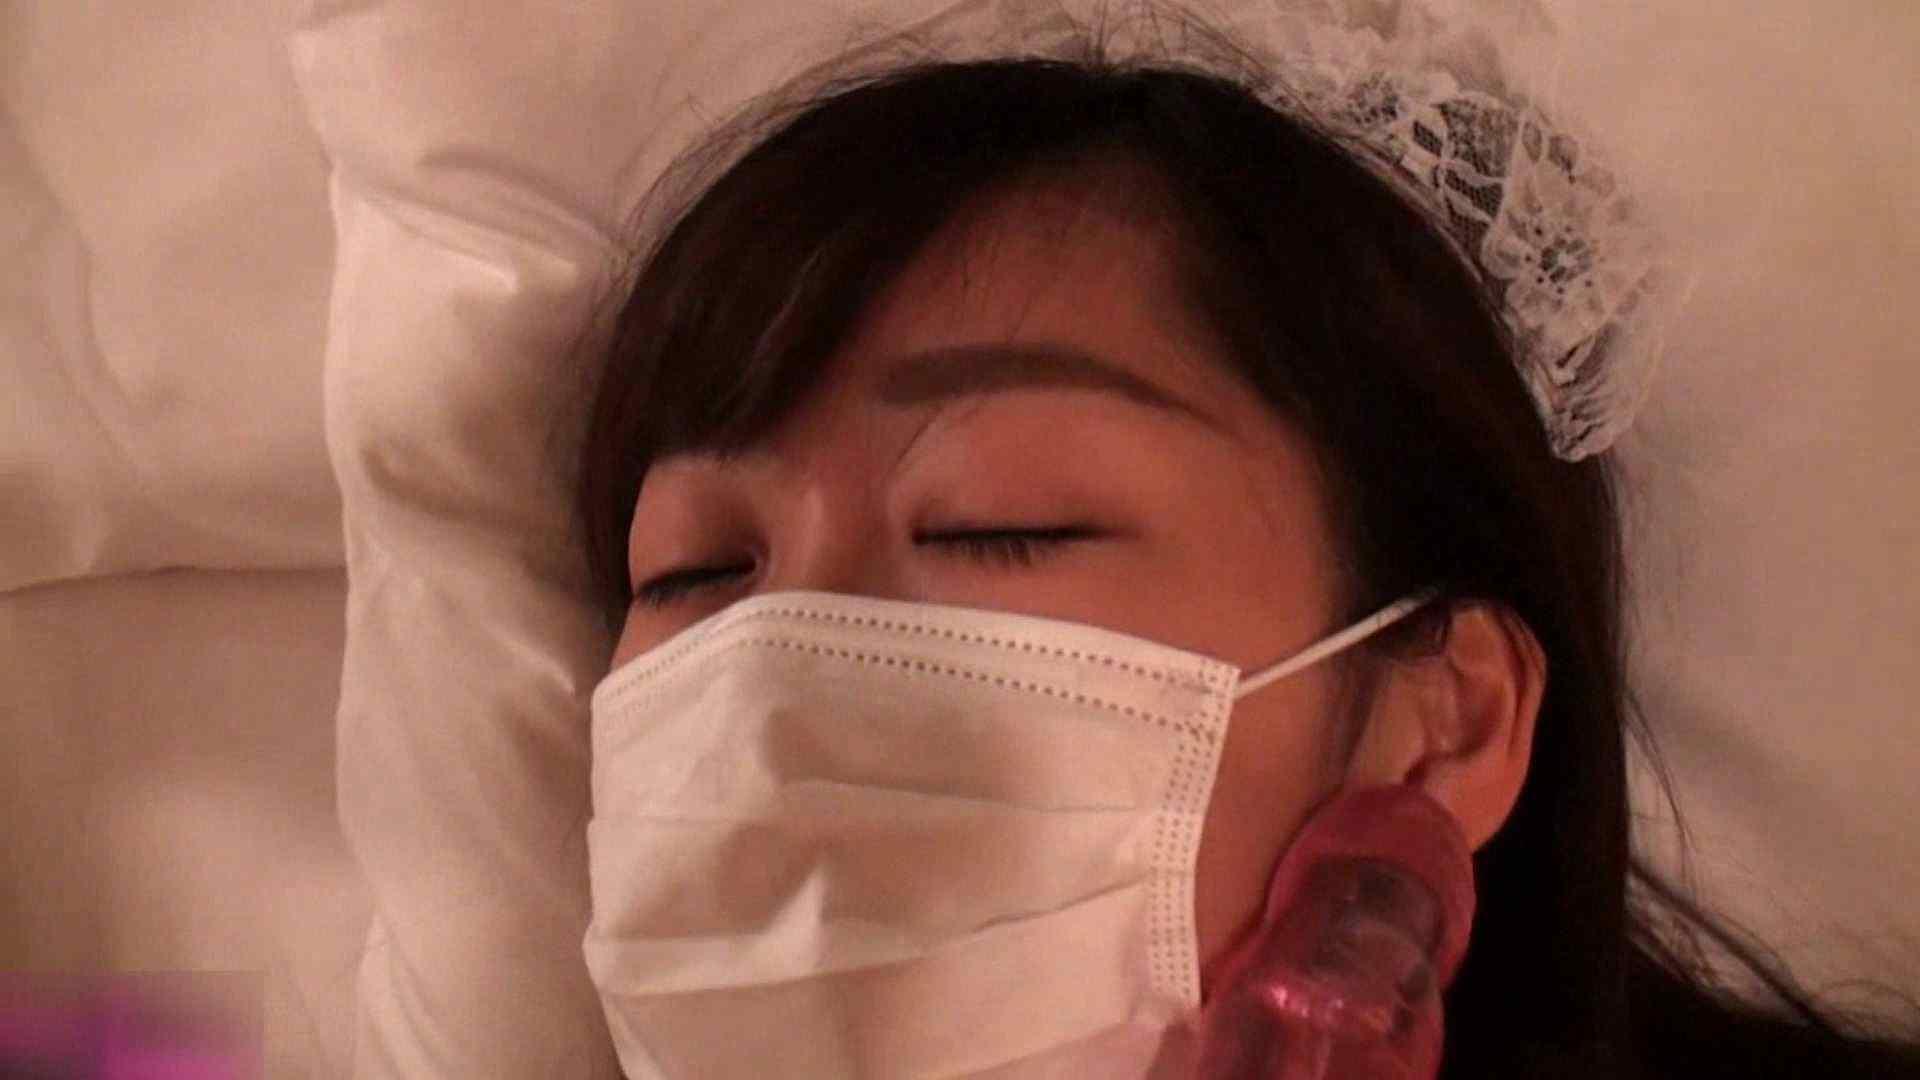 S級厳選美女ビッチガールVol.23 セックス  103枚 54